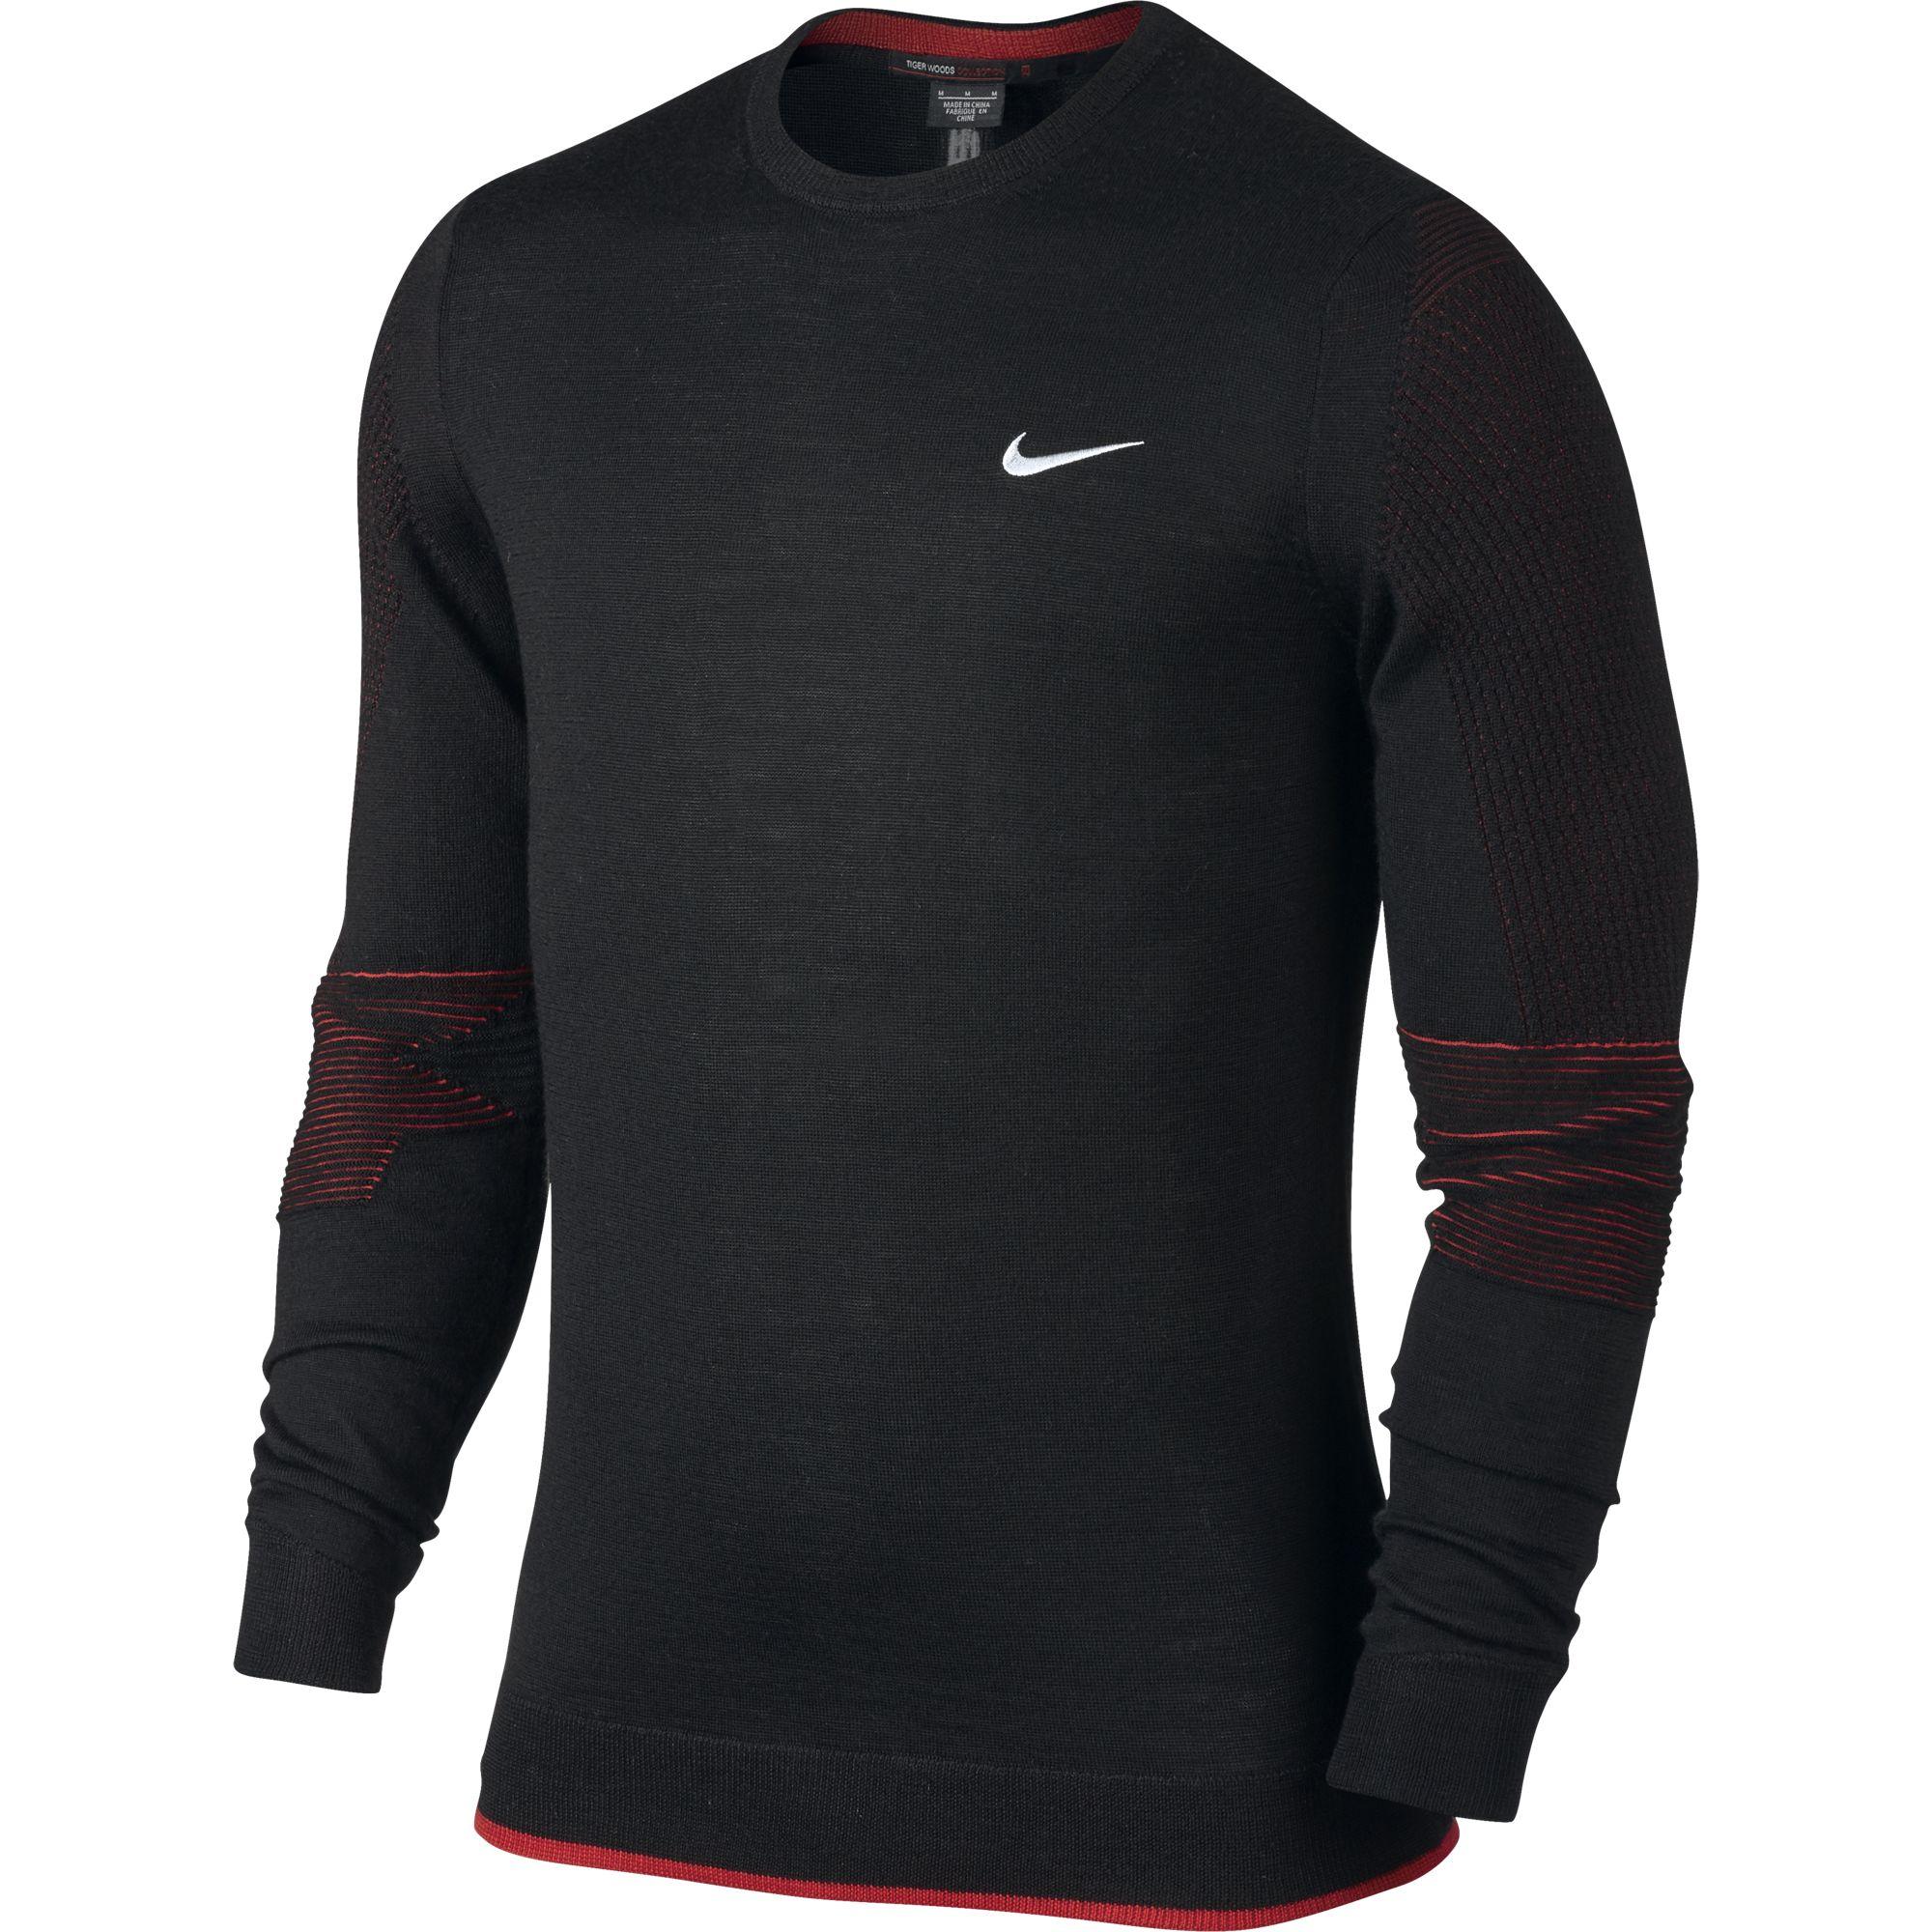 2017 nike tw wool crew sweater mens 810493 pick size